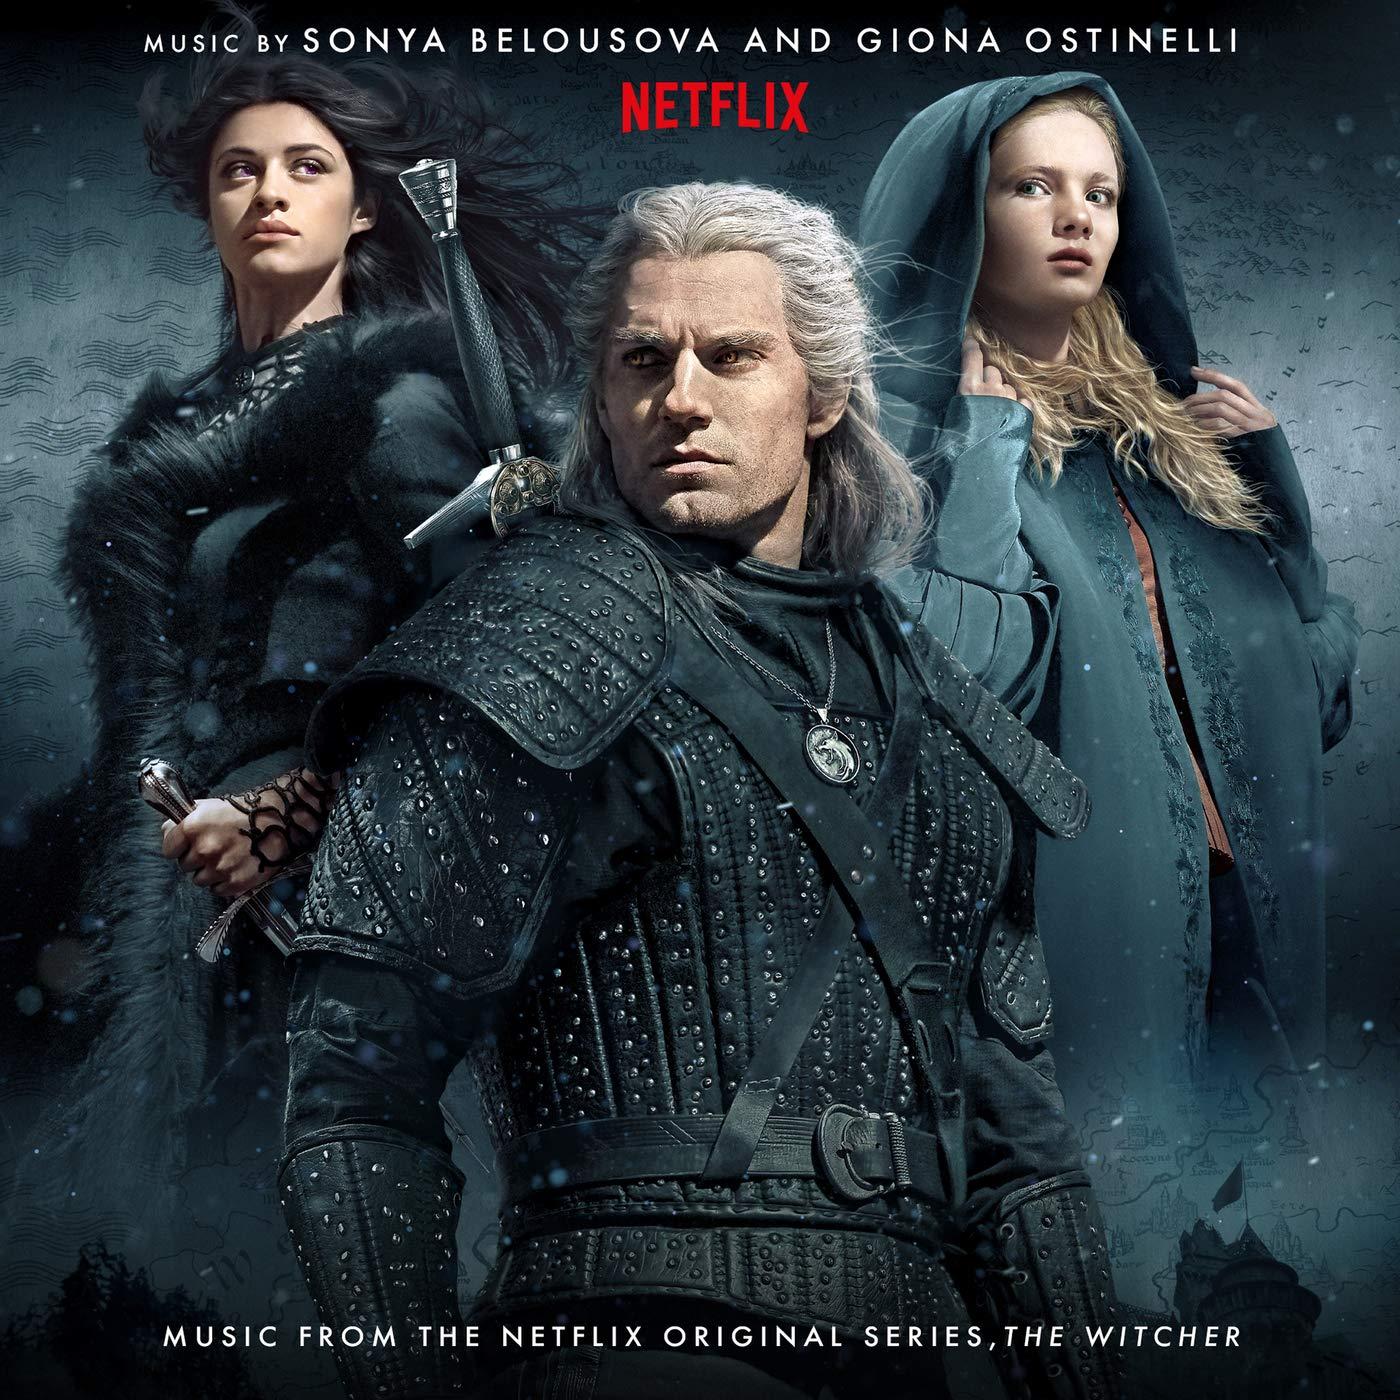 Sonya Belousova & Giona Ostinelli – The Witcher – Music From The Netflix Original Series (2020) [FLAC]